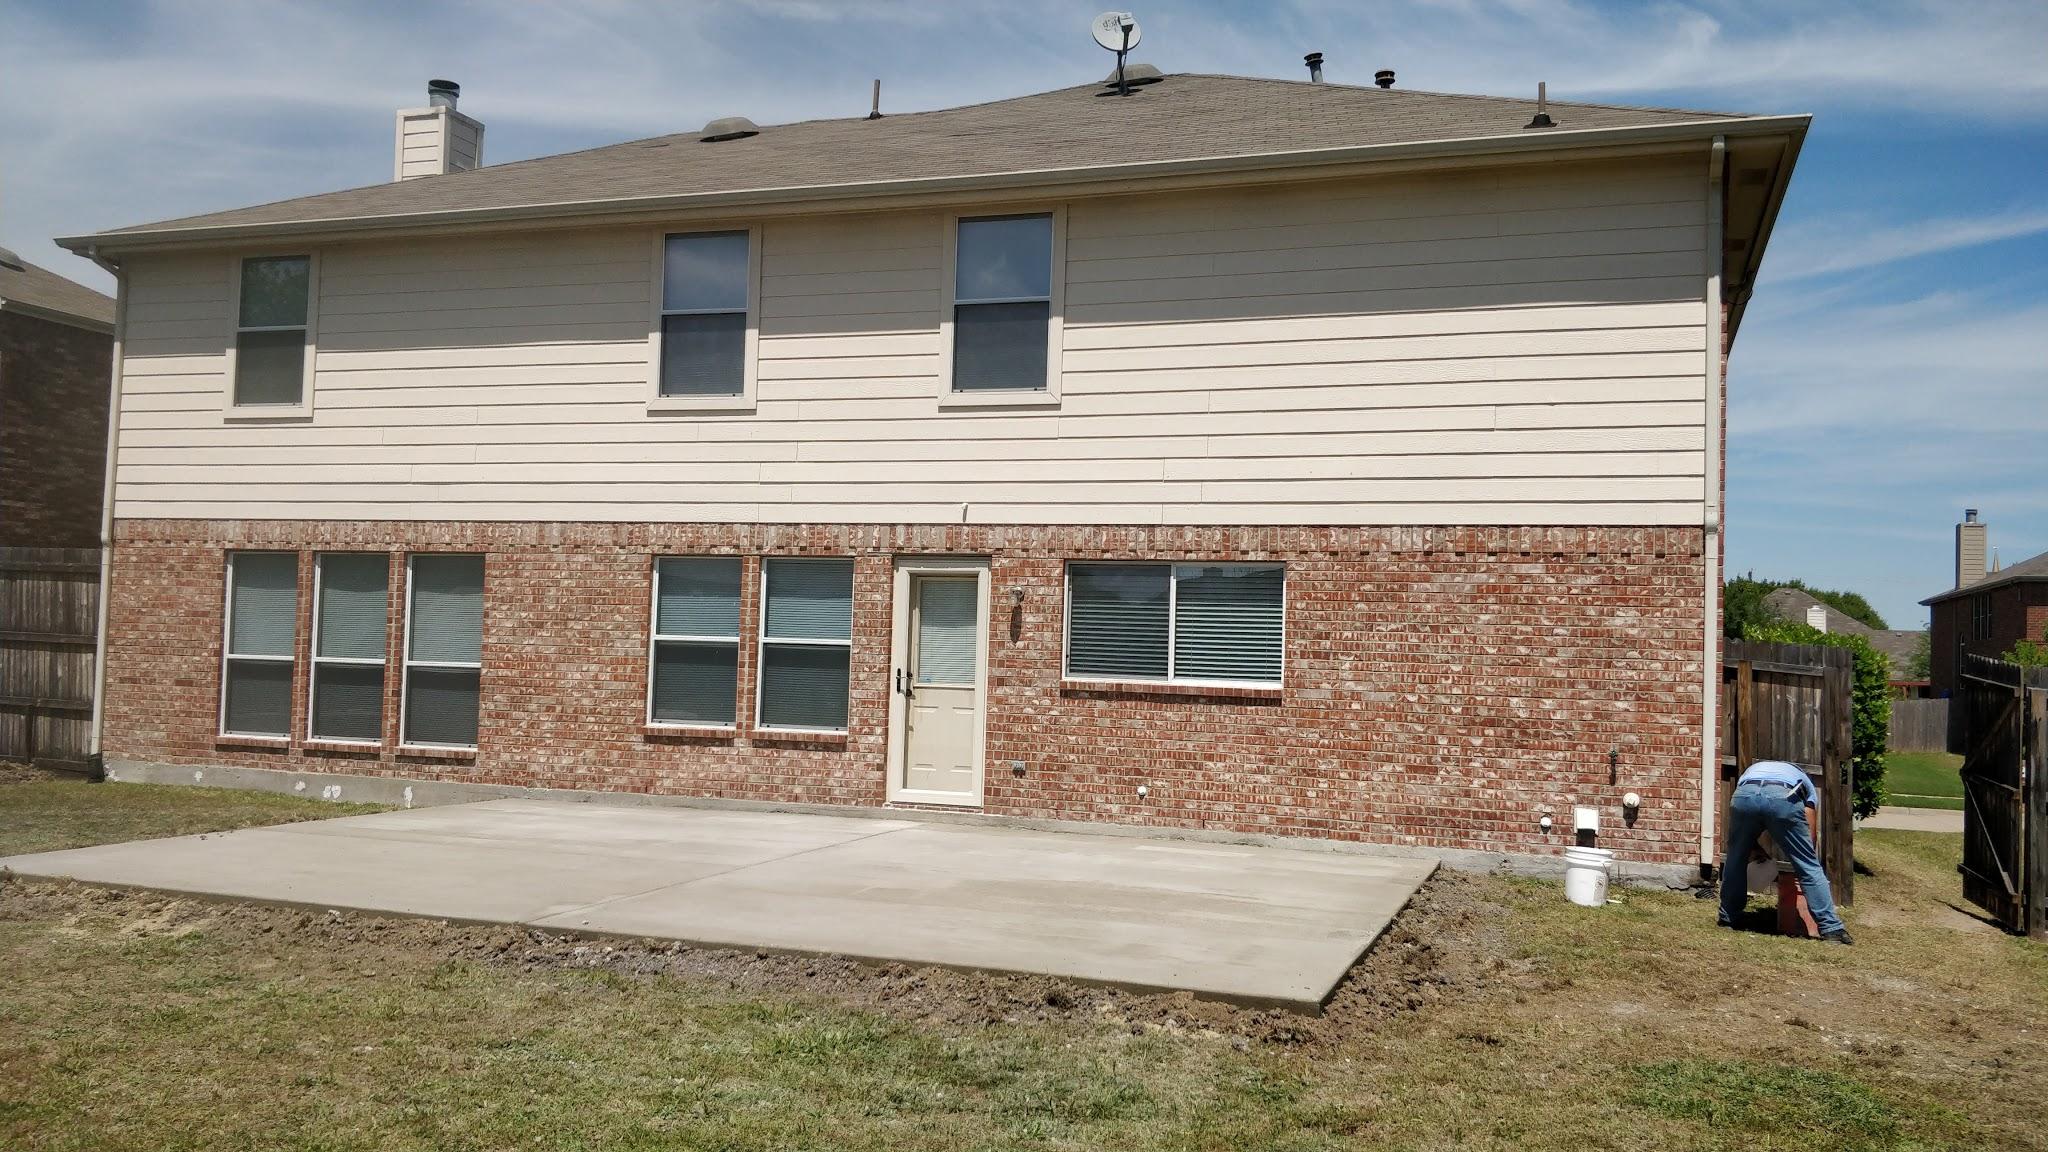 New Concrete Patio - Forney, TX